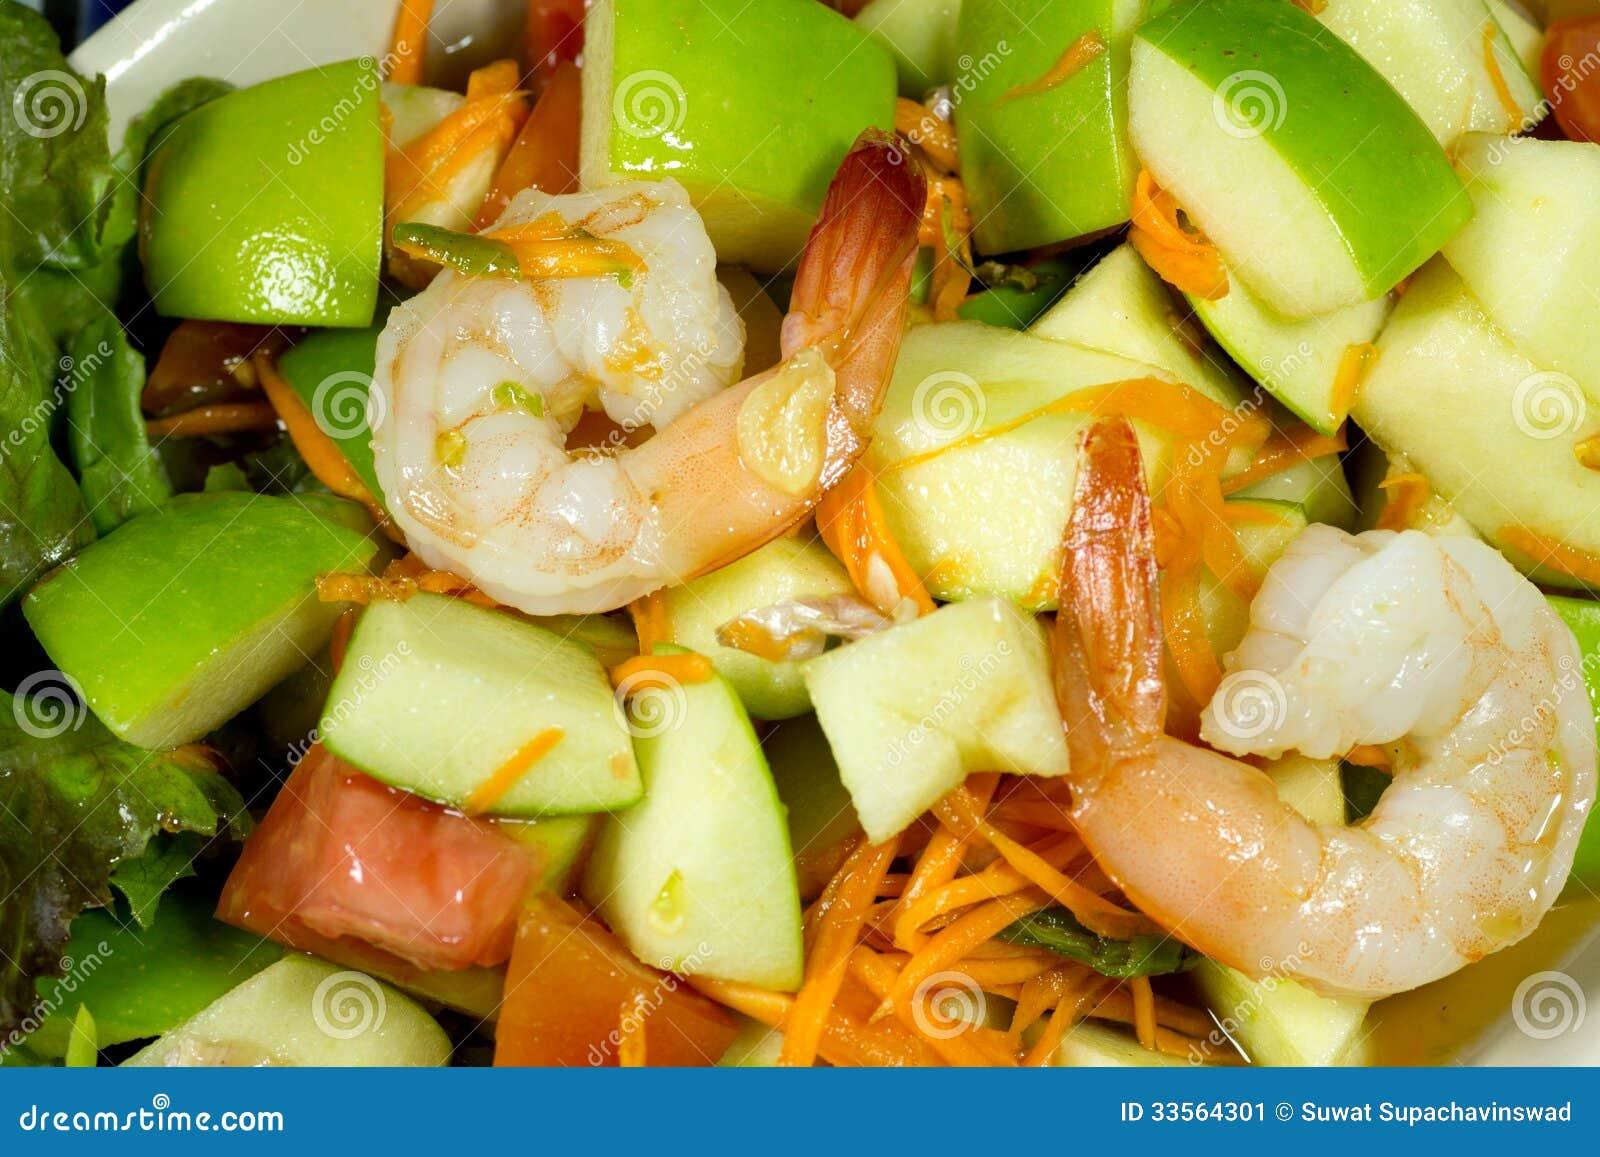 Stock Image: Apple shrimp salad thai style